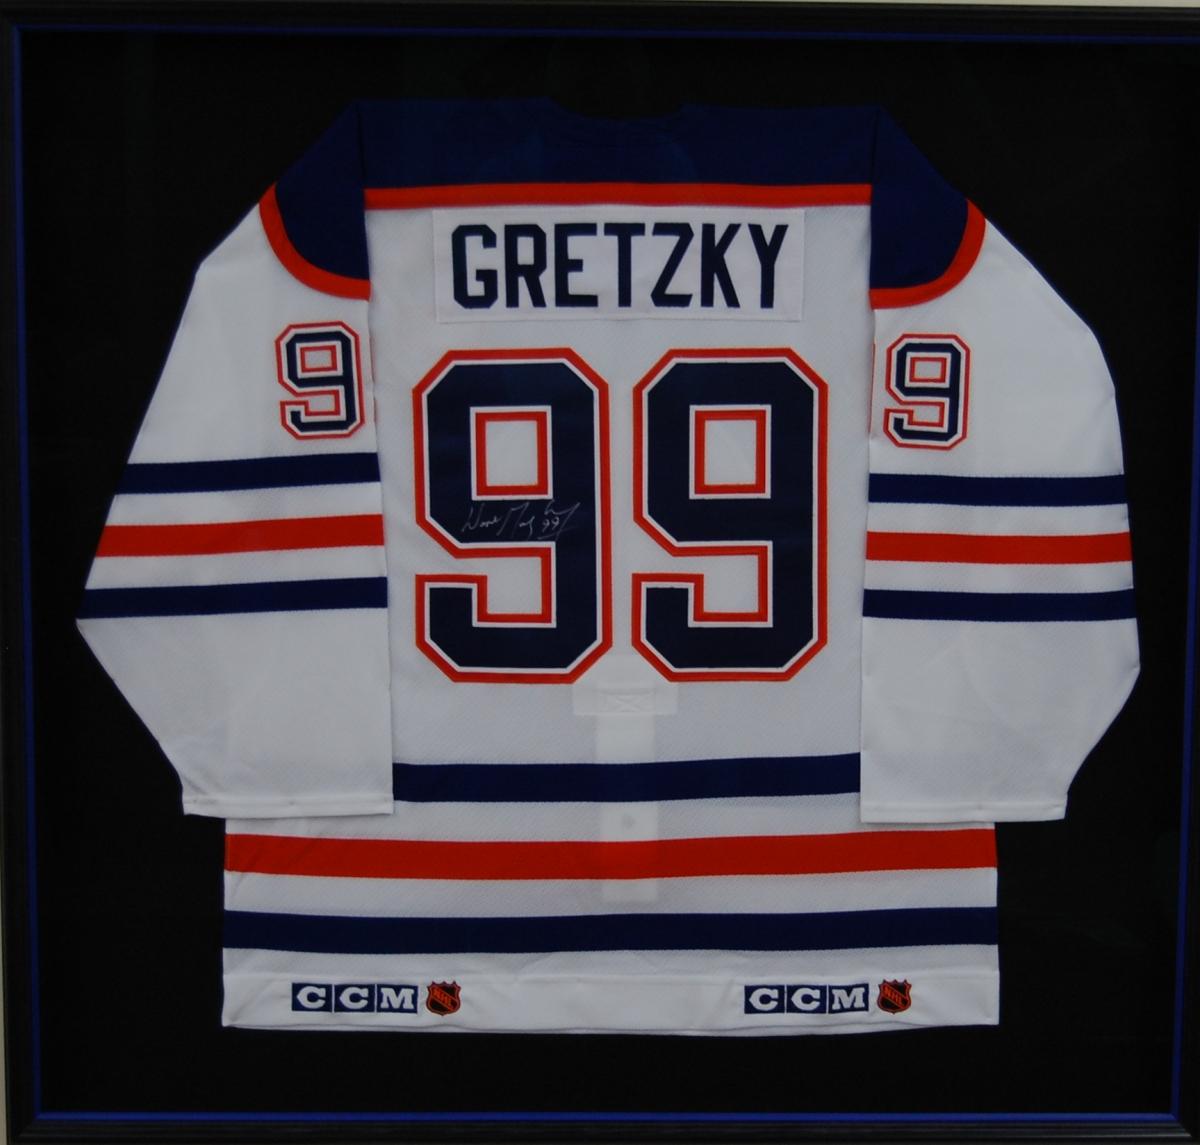 Gretzky Hockey Jersey